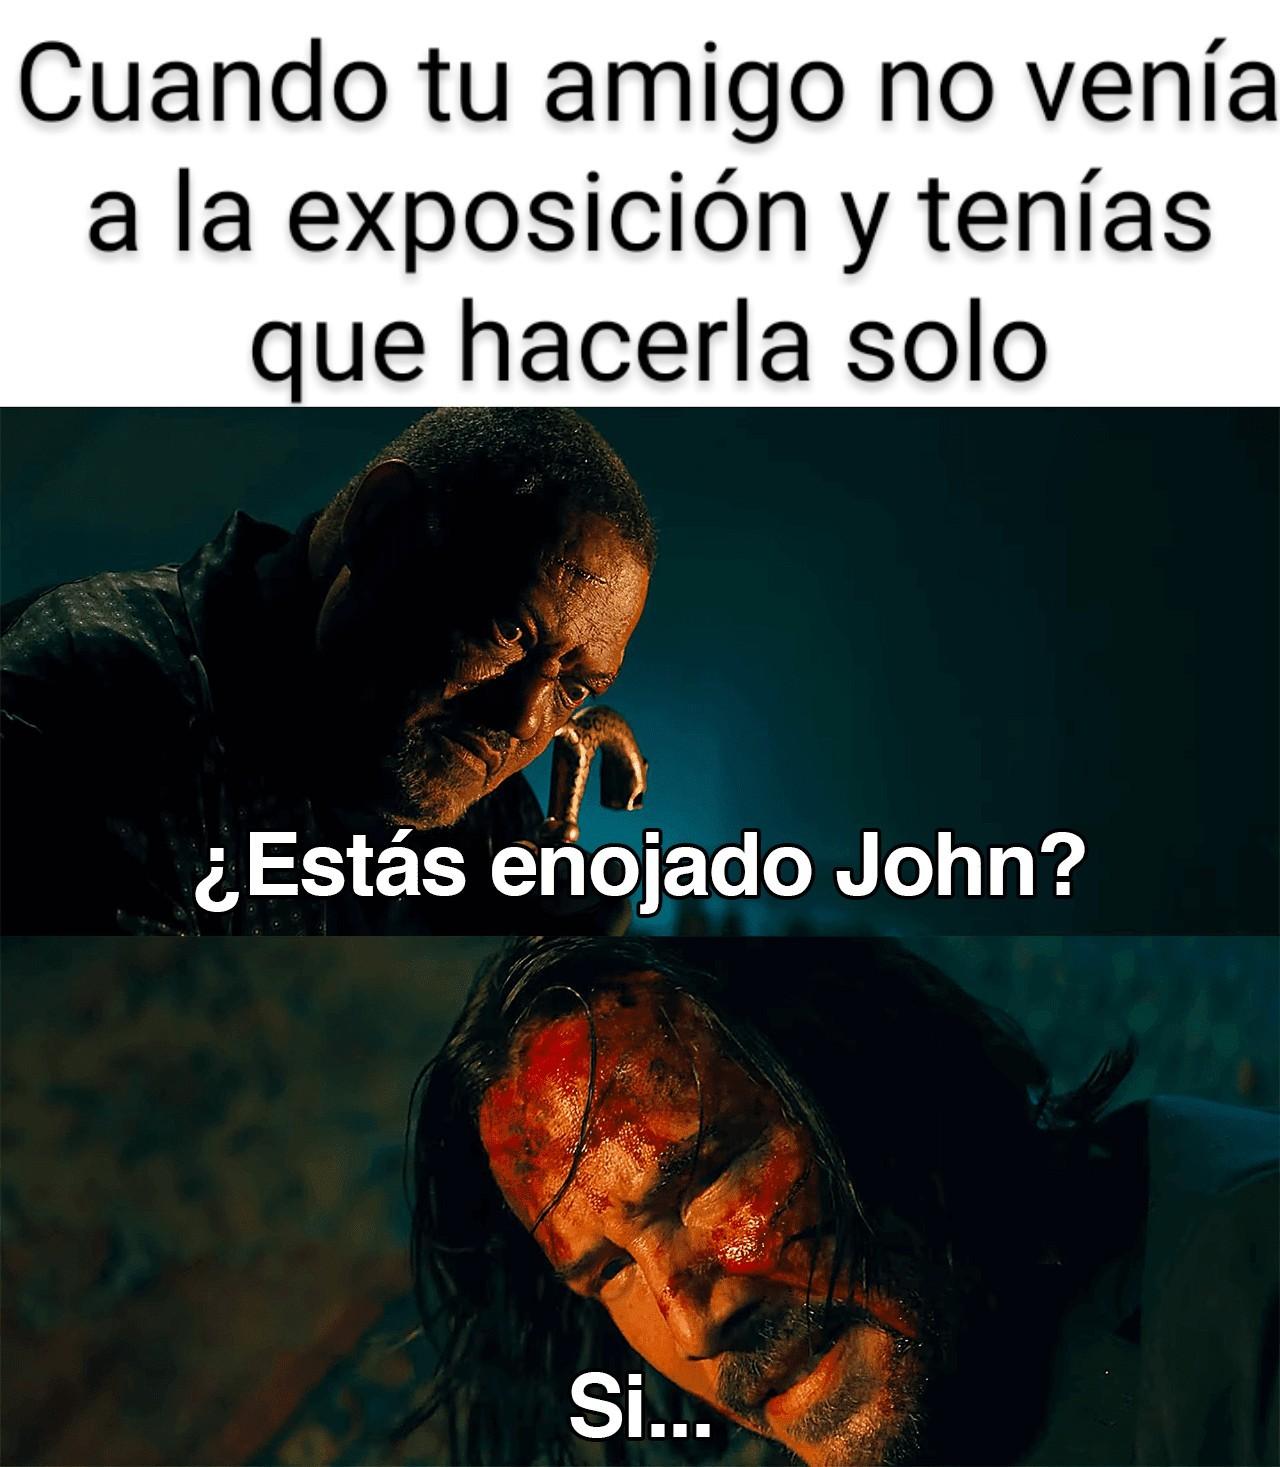 ¿Estás enojado Jonh? - meme